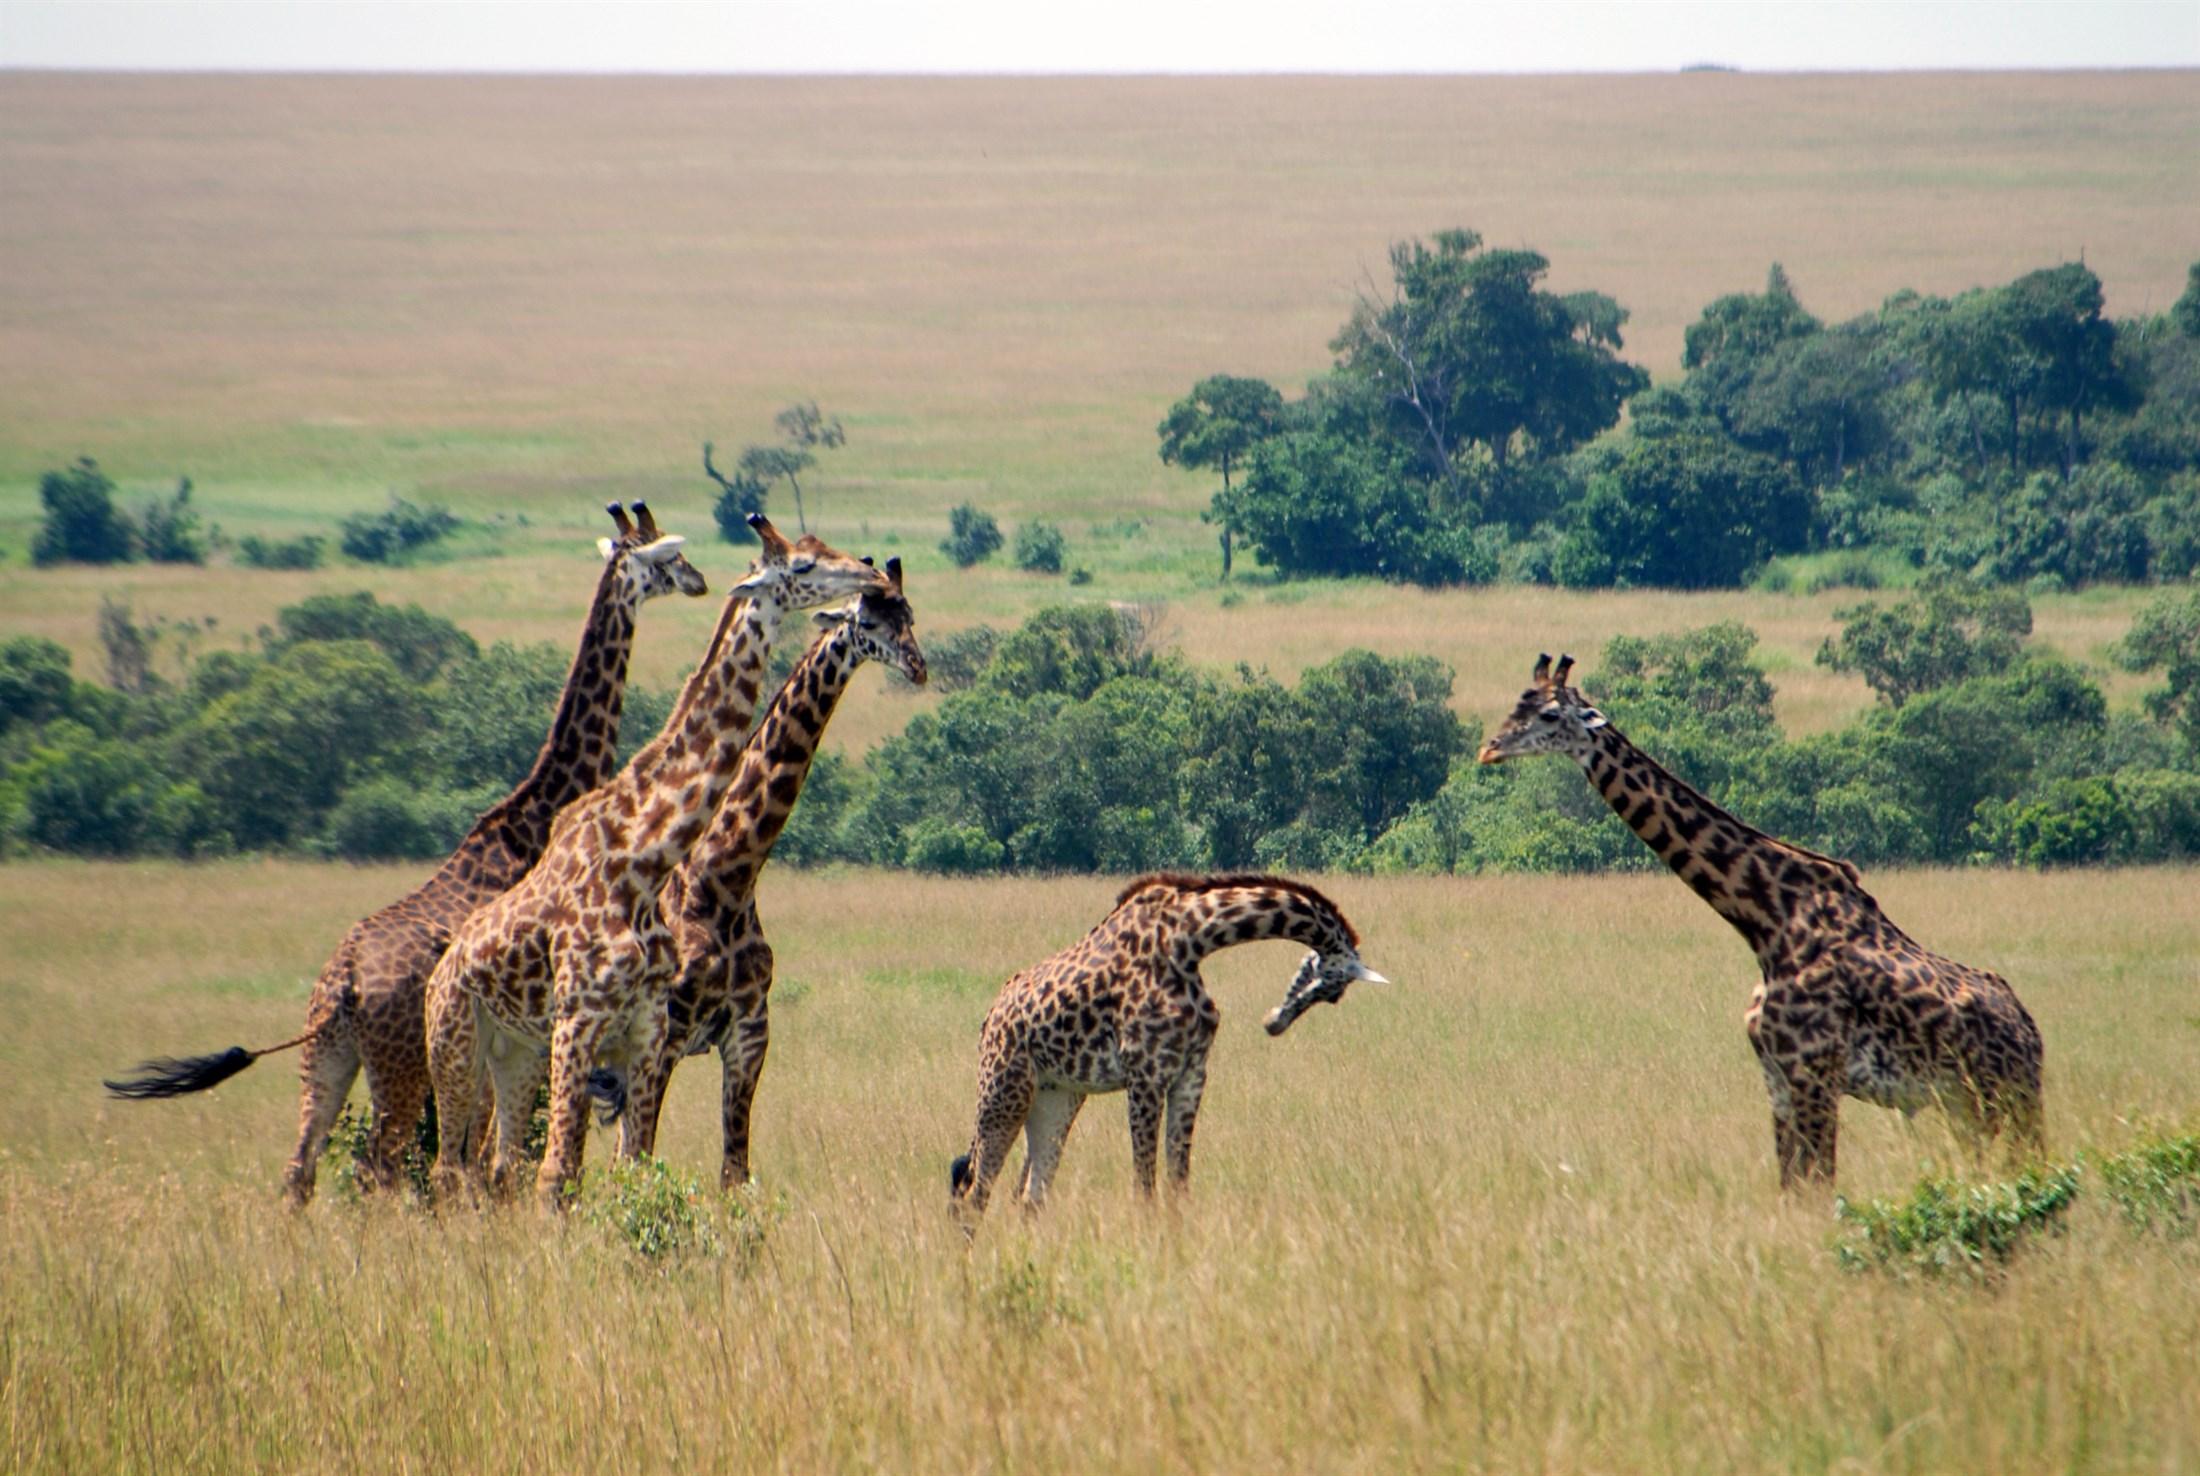 masai-giraffe-giraffa-camelopardalis-tippelskirchi-masai-mara-reserve-kenya_d0f7-2200x1476px